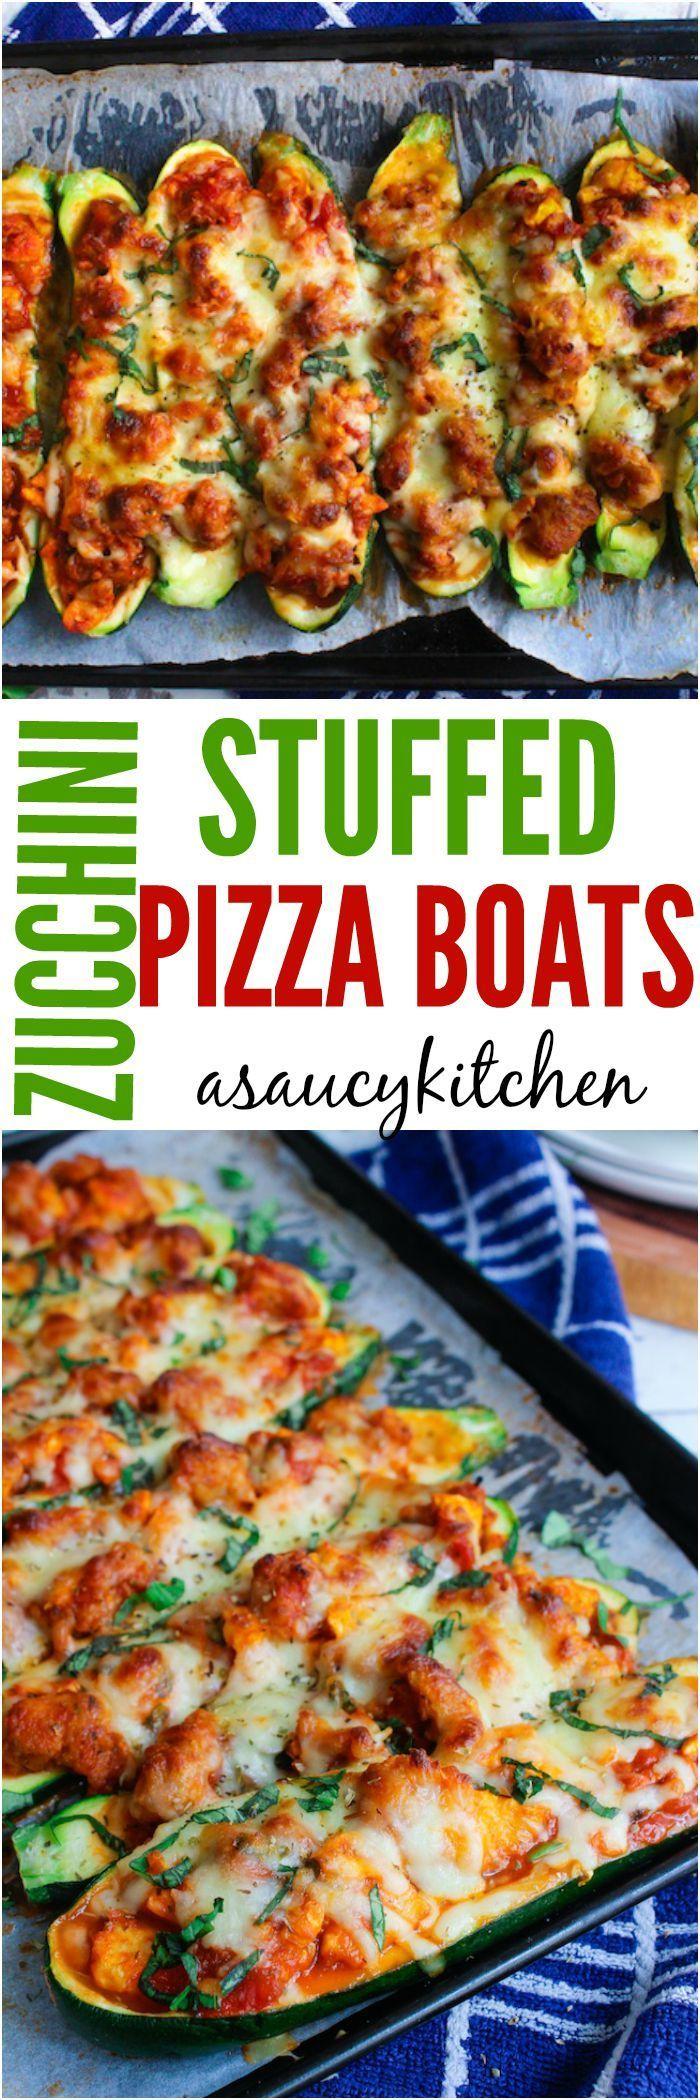 Zucchini Pizza Boats  www.asaucykitchen.com